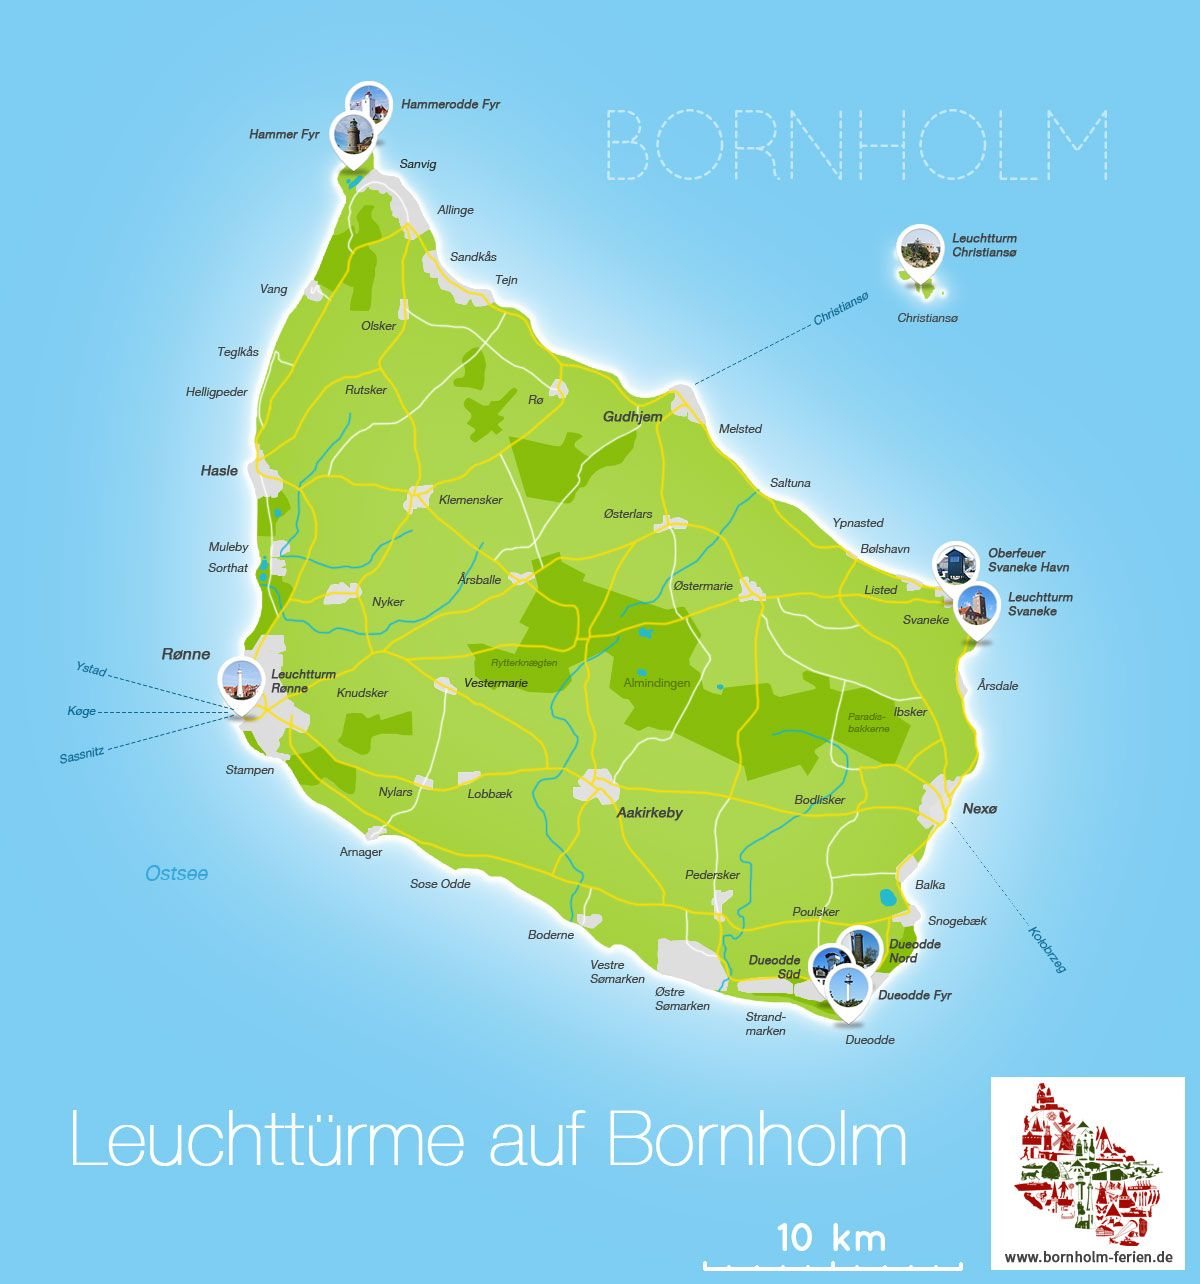 leuchttürme dänemark karte Karte der Leuchttürme auf Bornholm #karte #leuchttuerme #bornholm